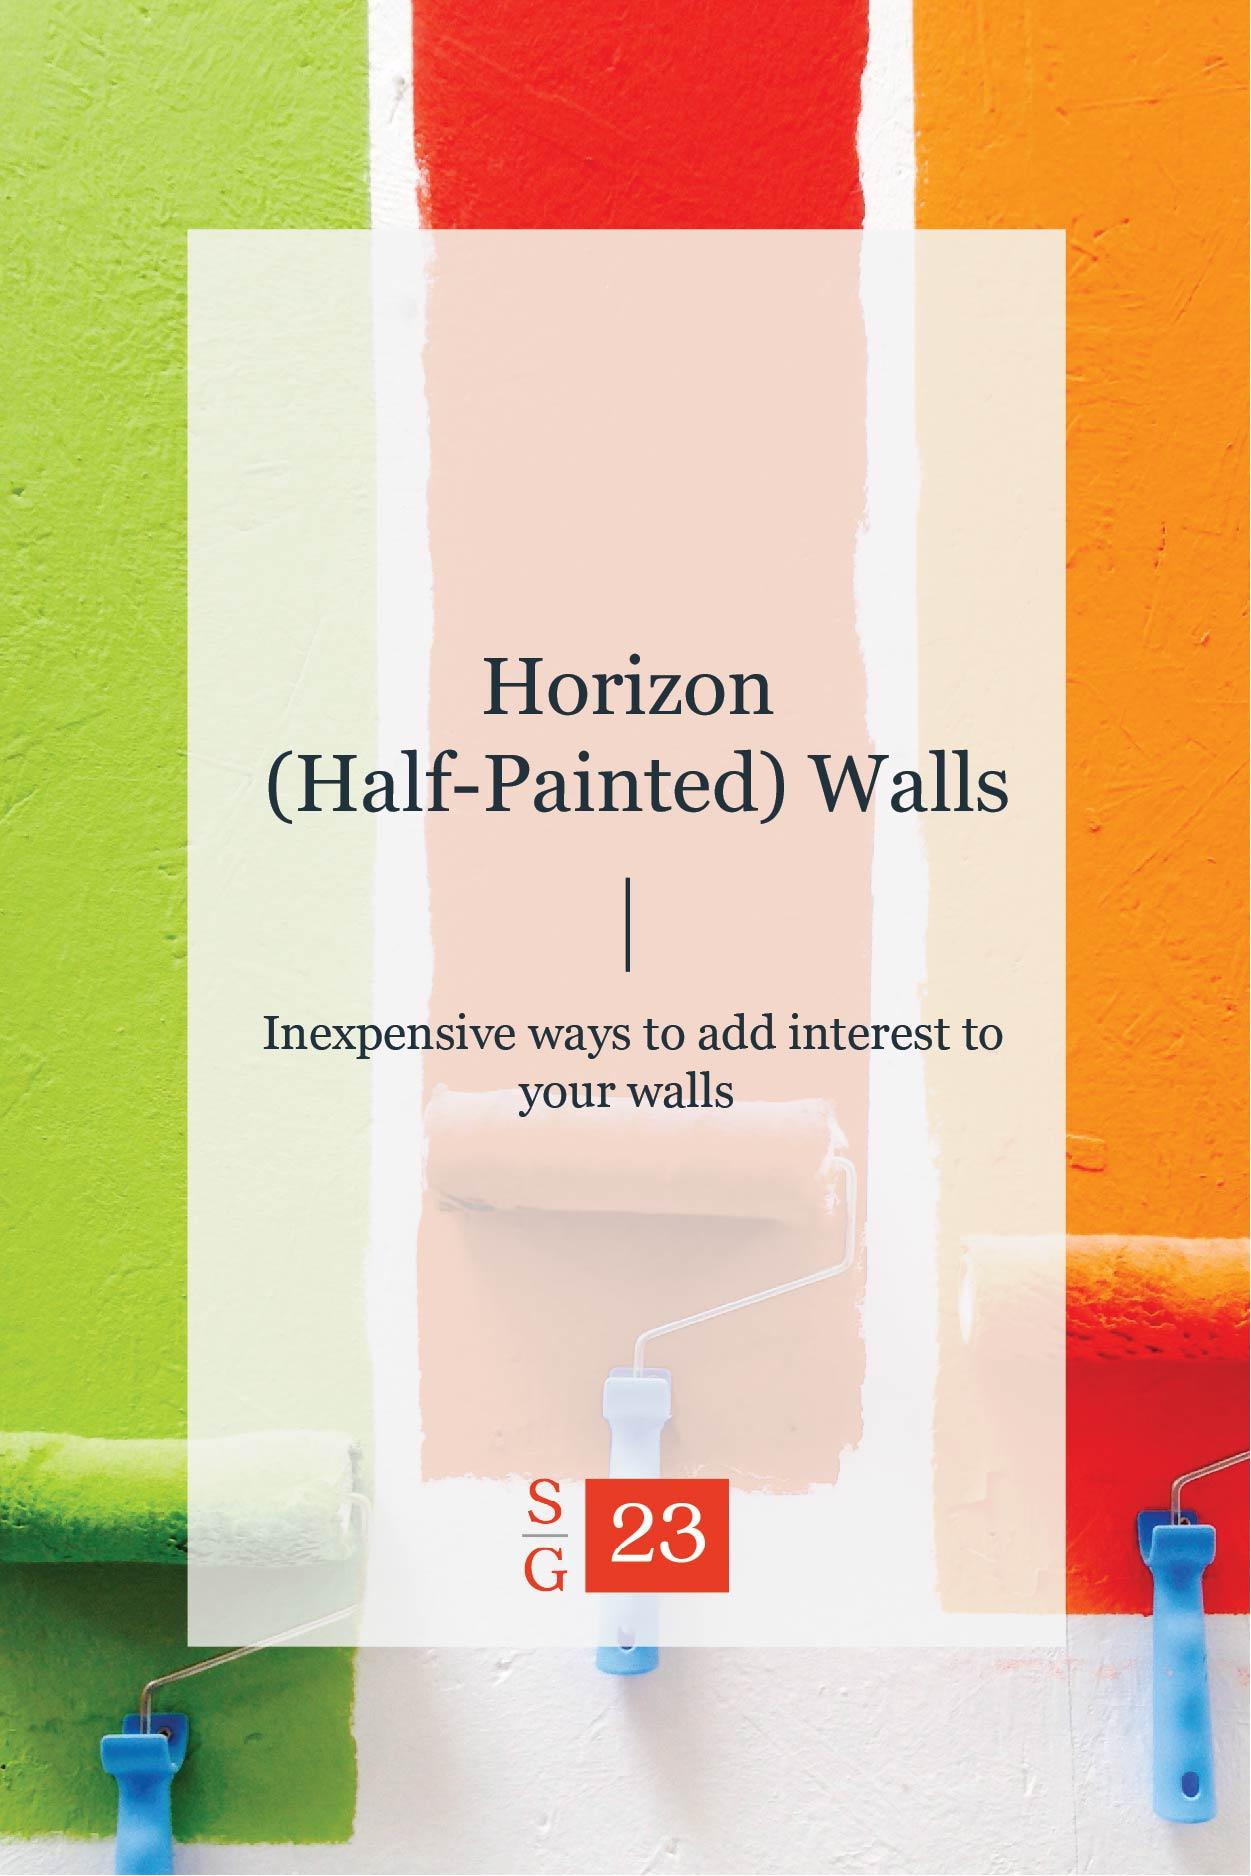 horizon-walls-01.jpg